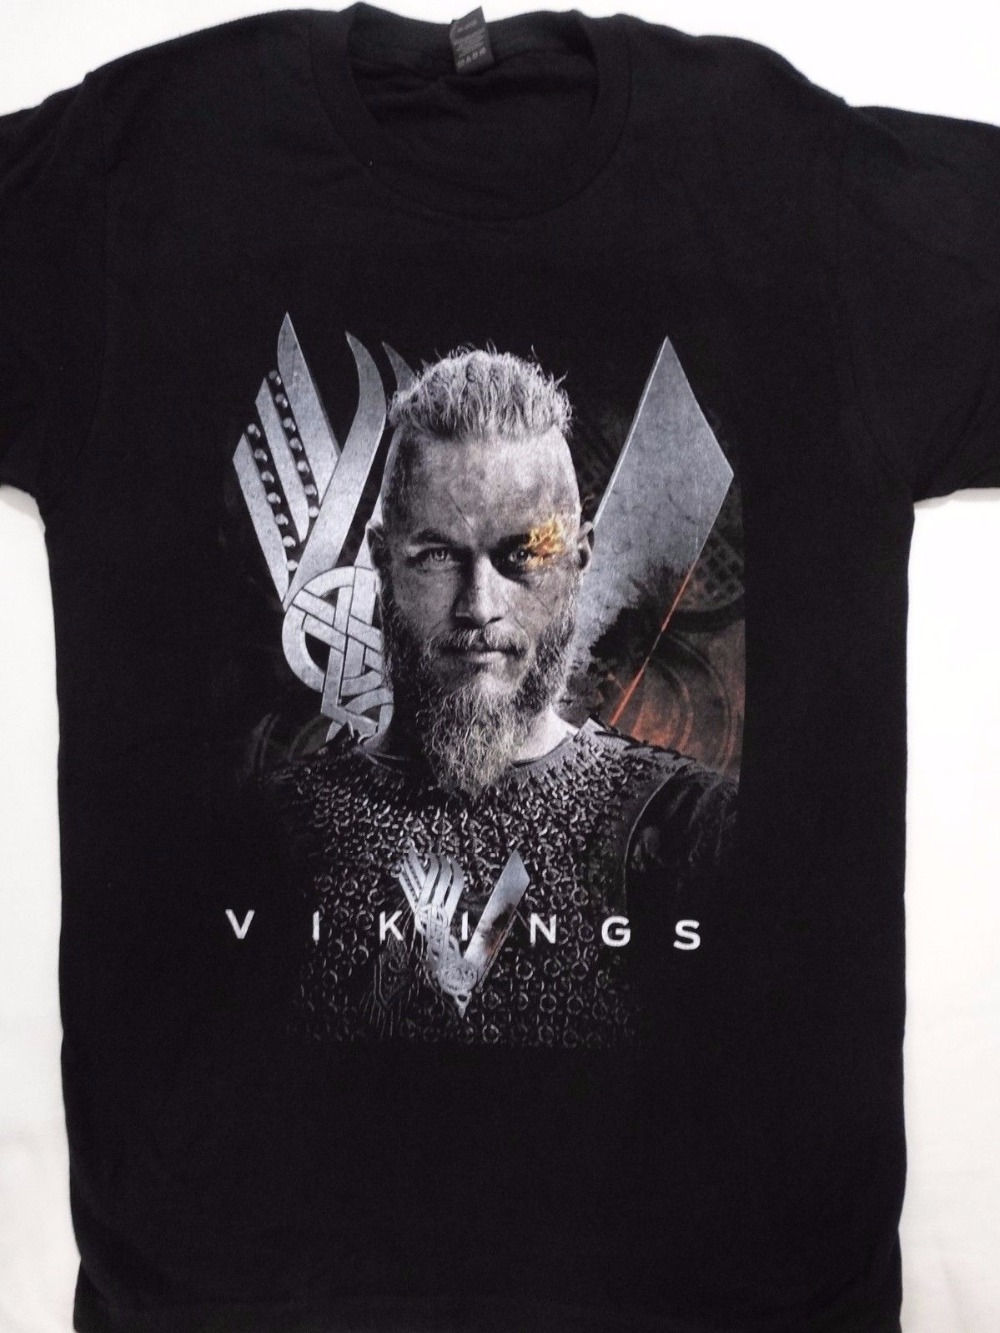 Order T Shirts Short Sleeve Men Printing Vikings History Tv Show O-Neck Shirt